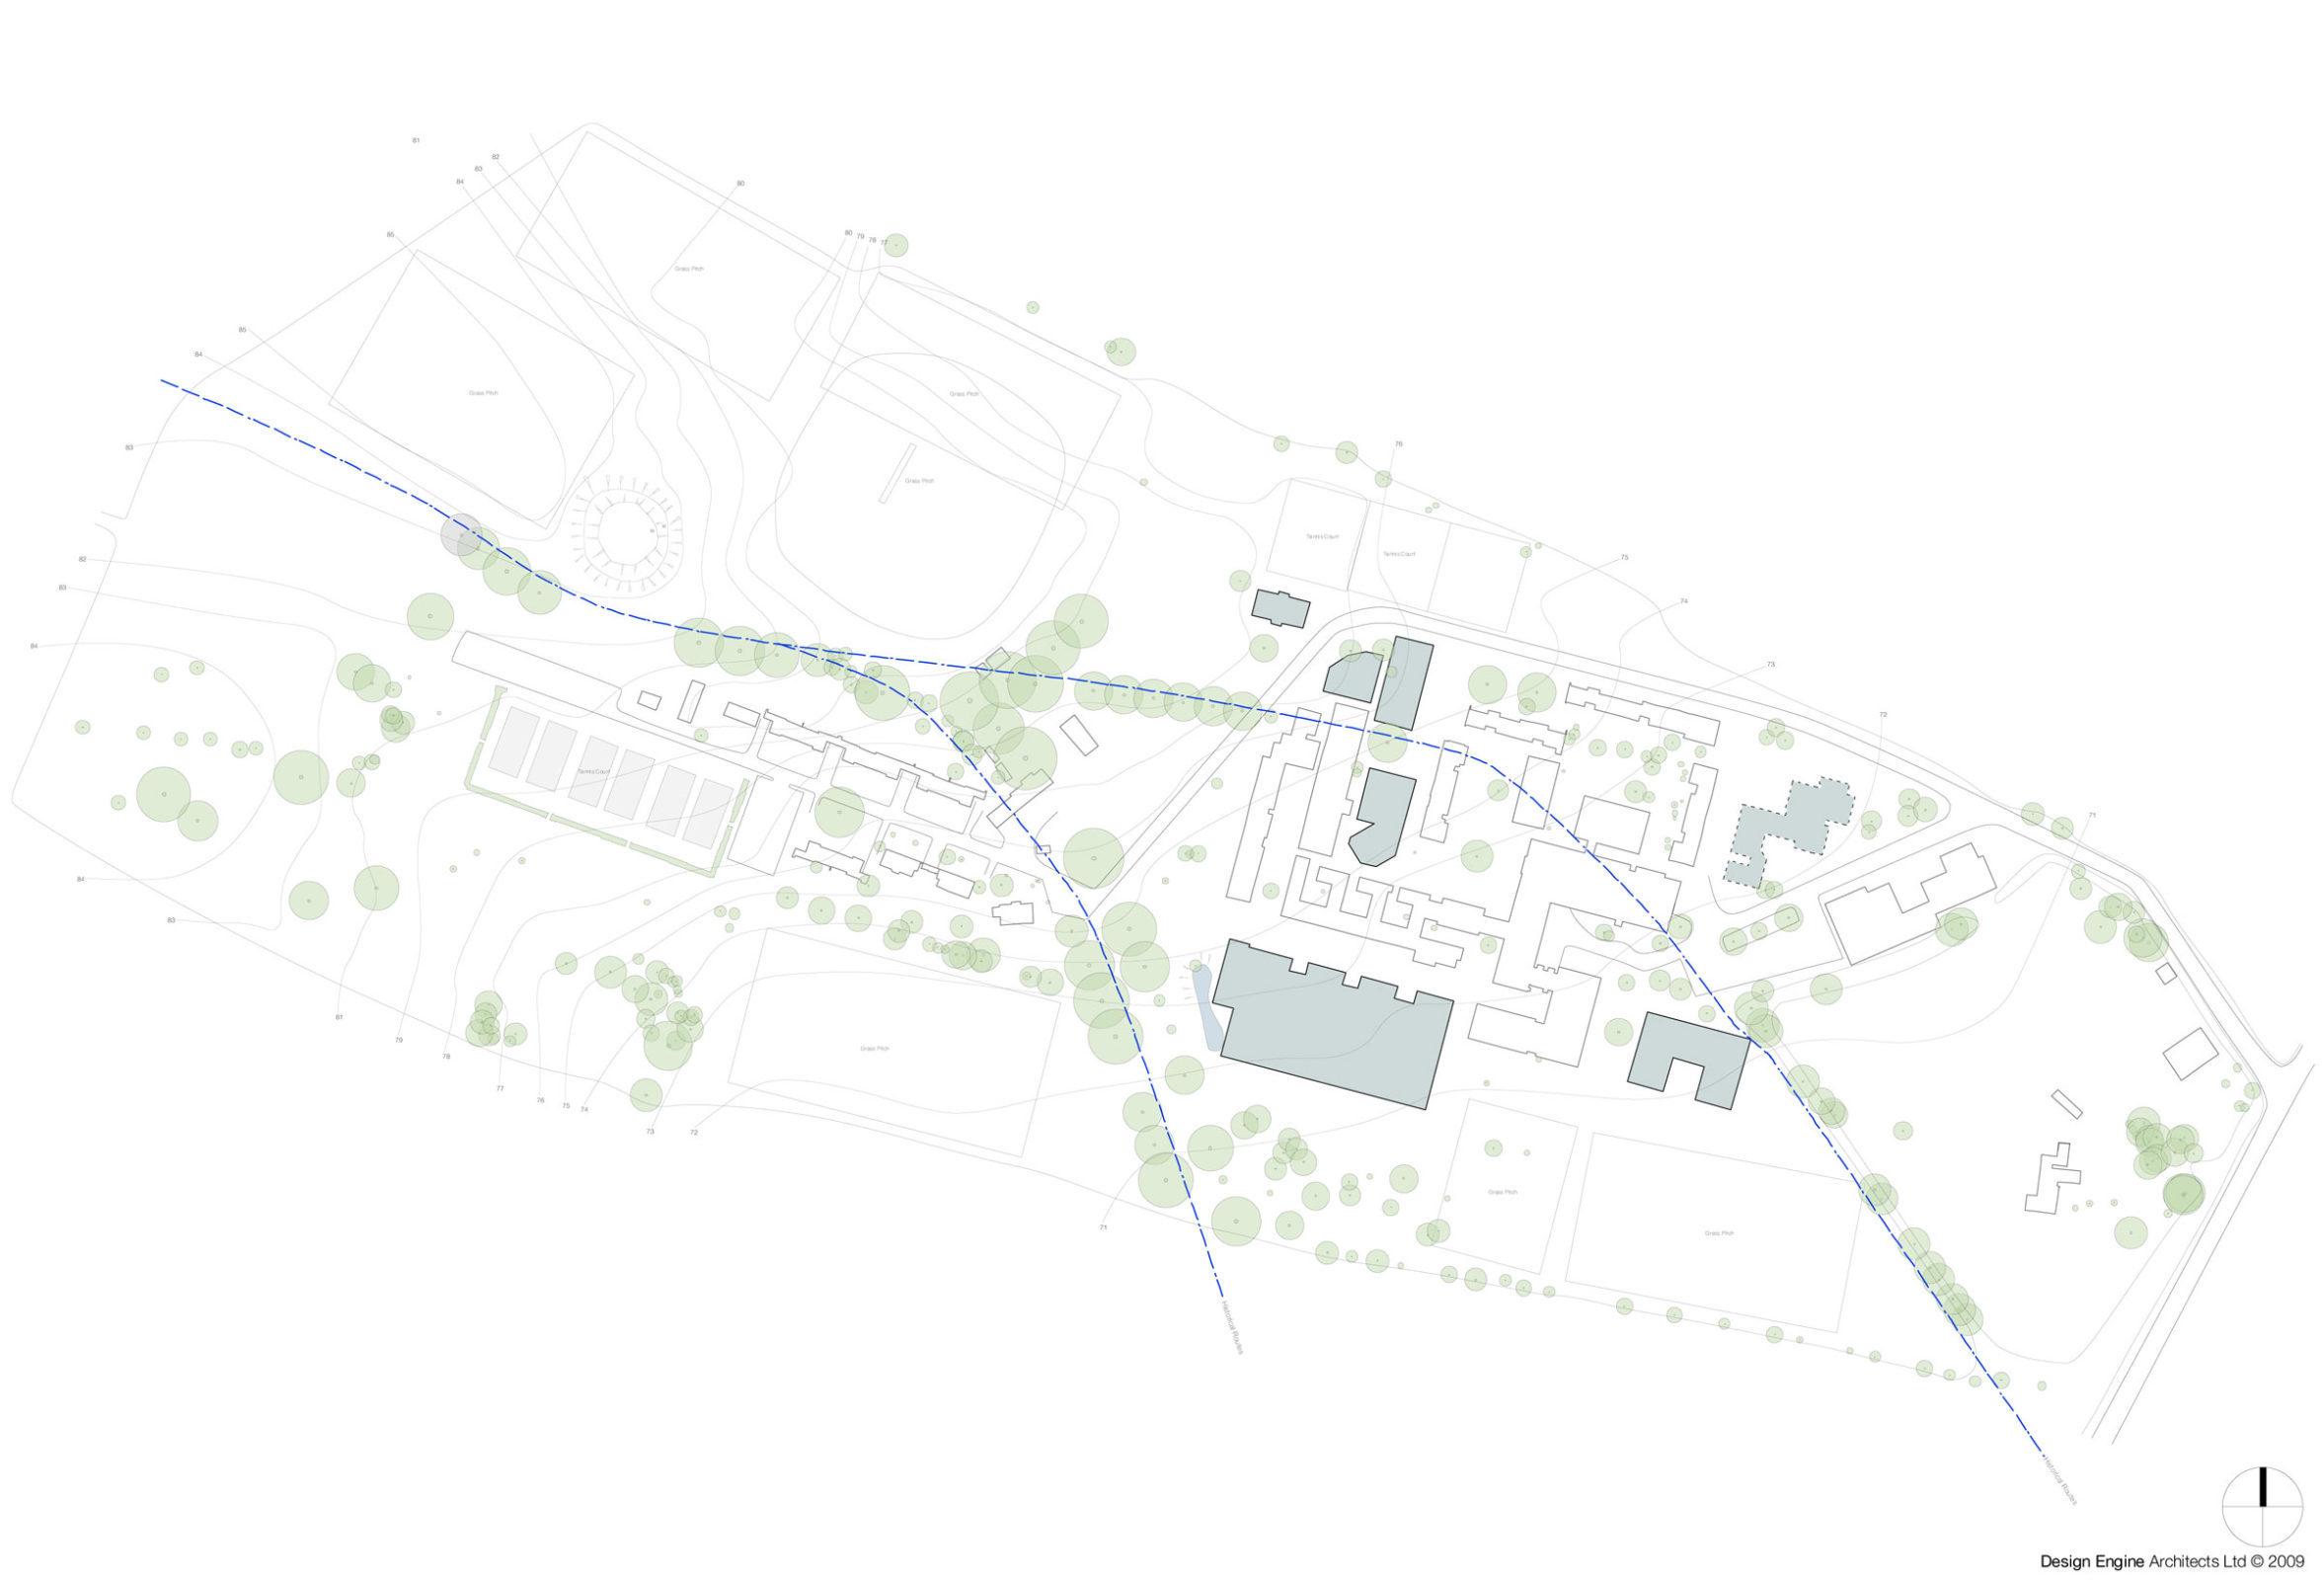 OBU Wheatley Masterplan Buildings For Retention